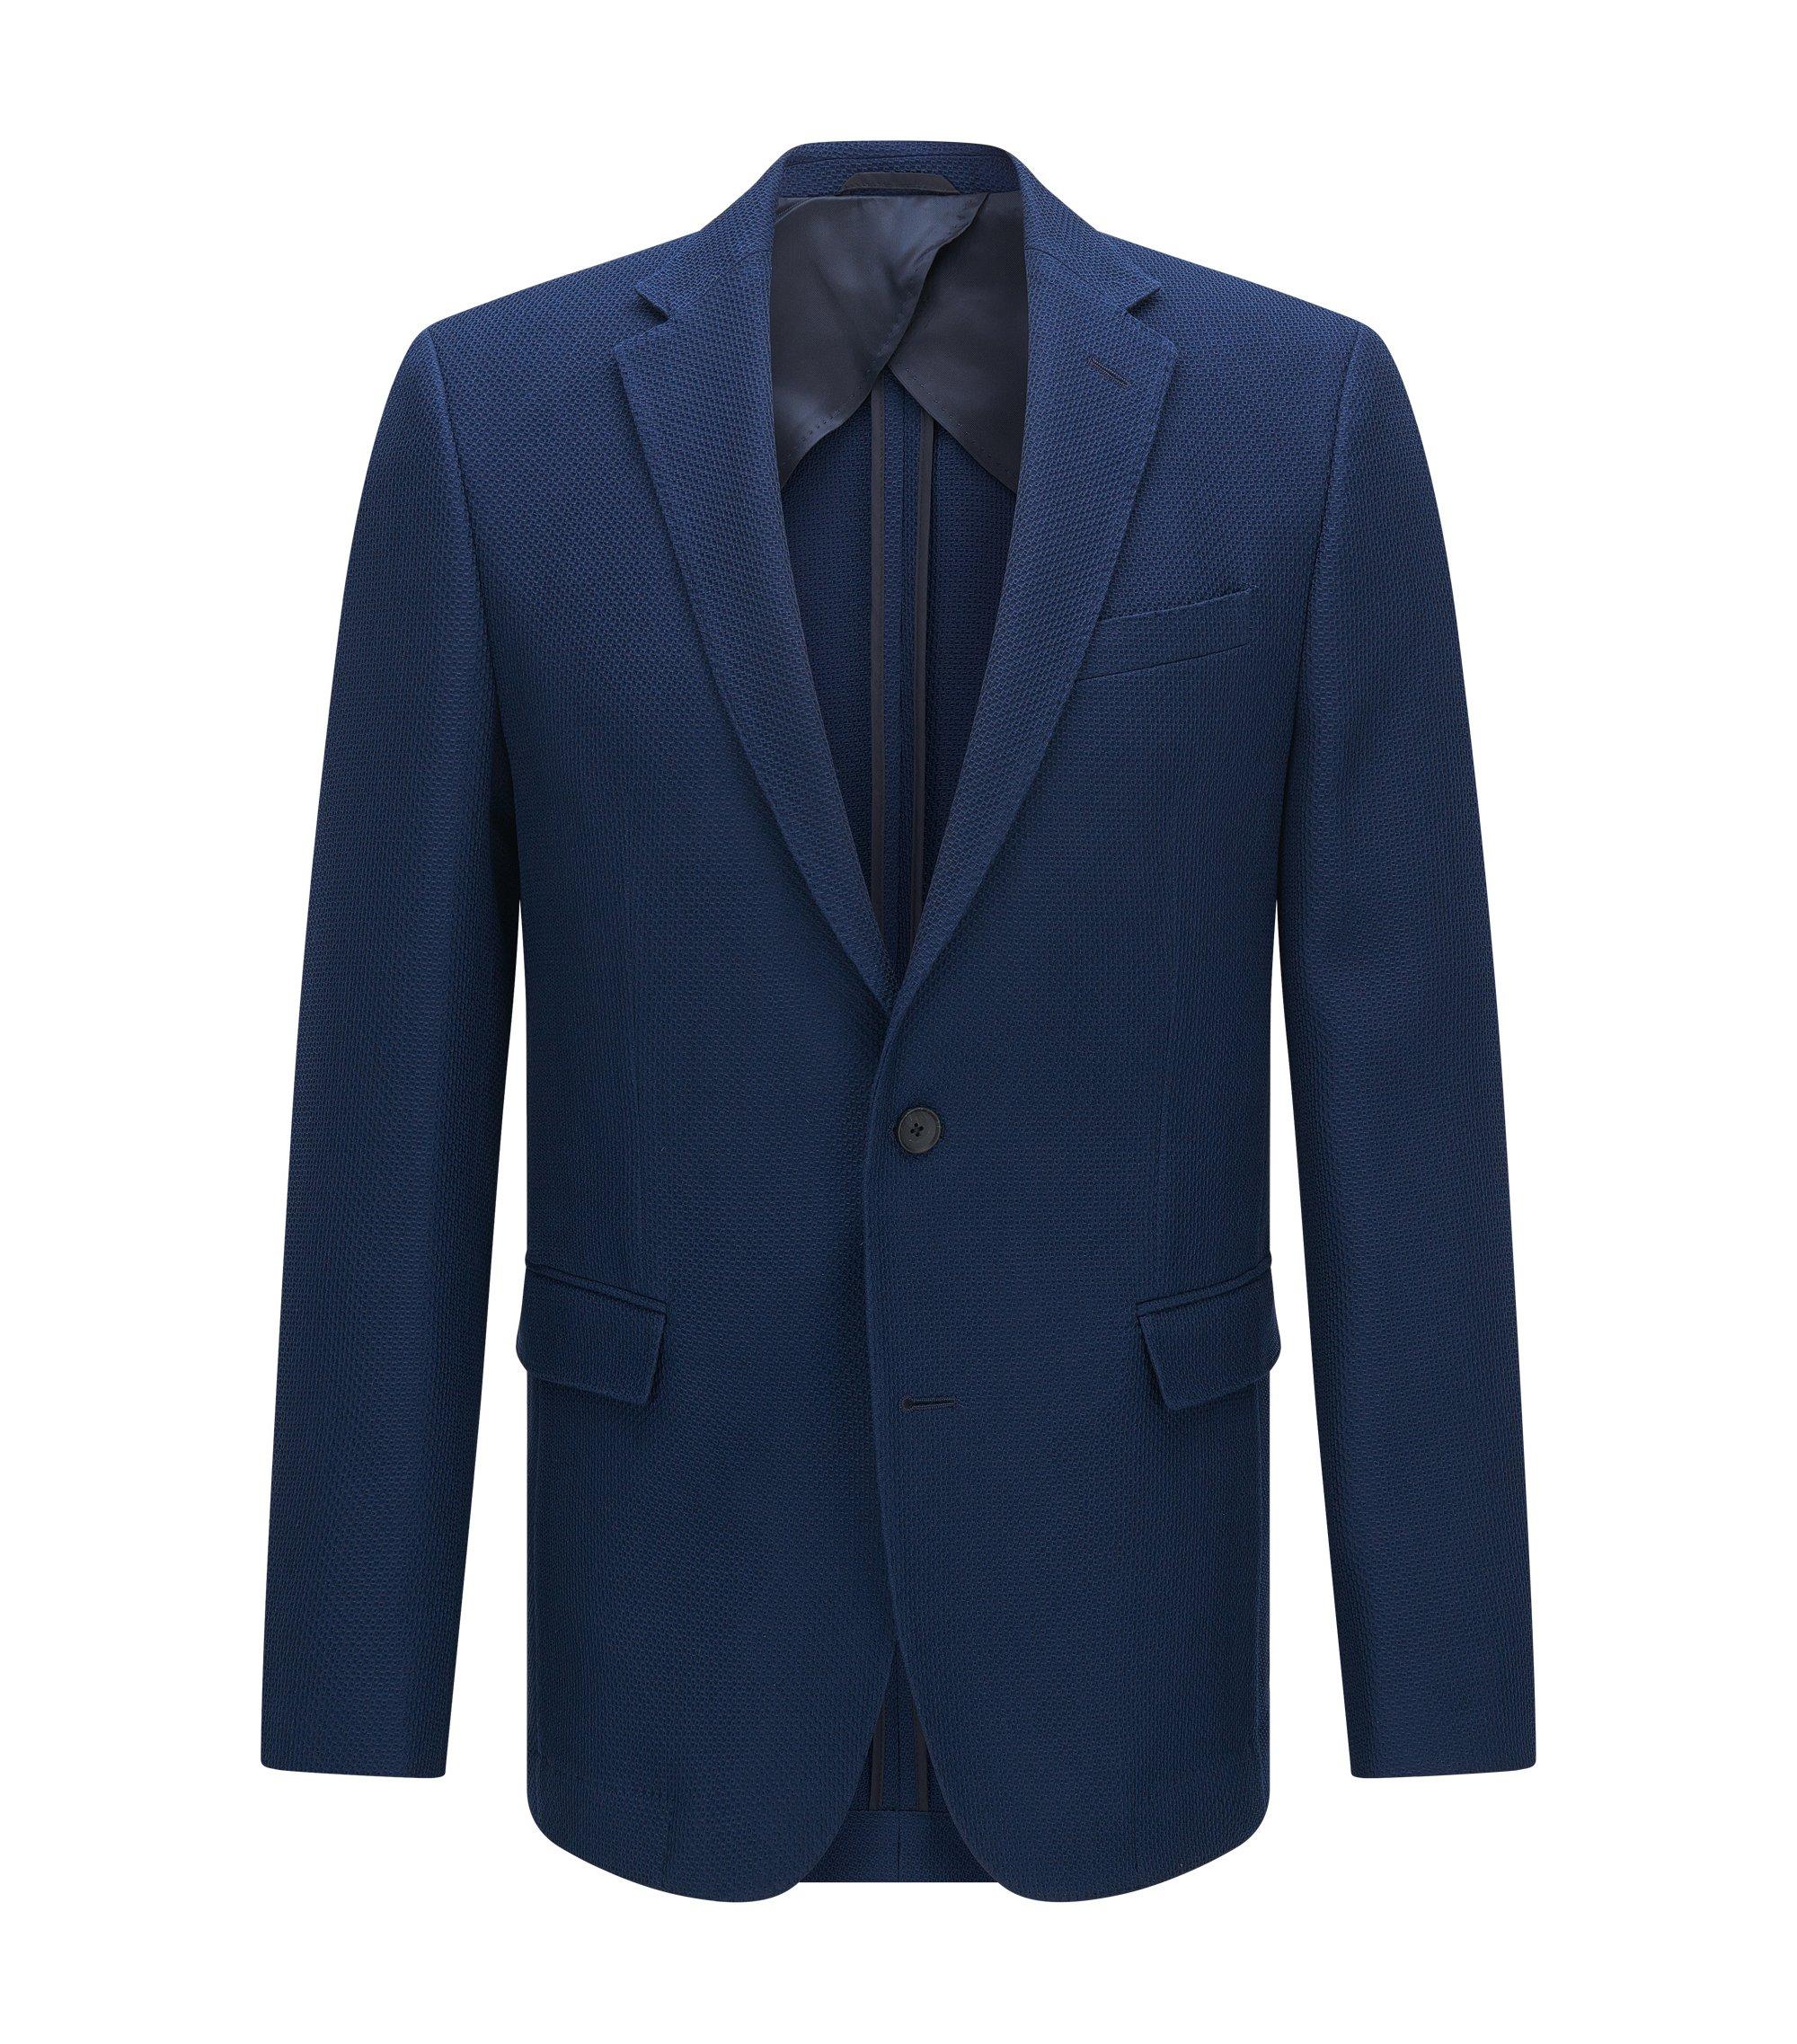 Virgin Wool Cotton Sport Coat, Slim Fit   Nobis, Dark Blue